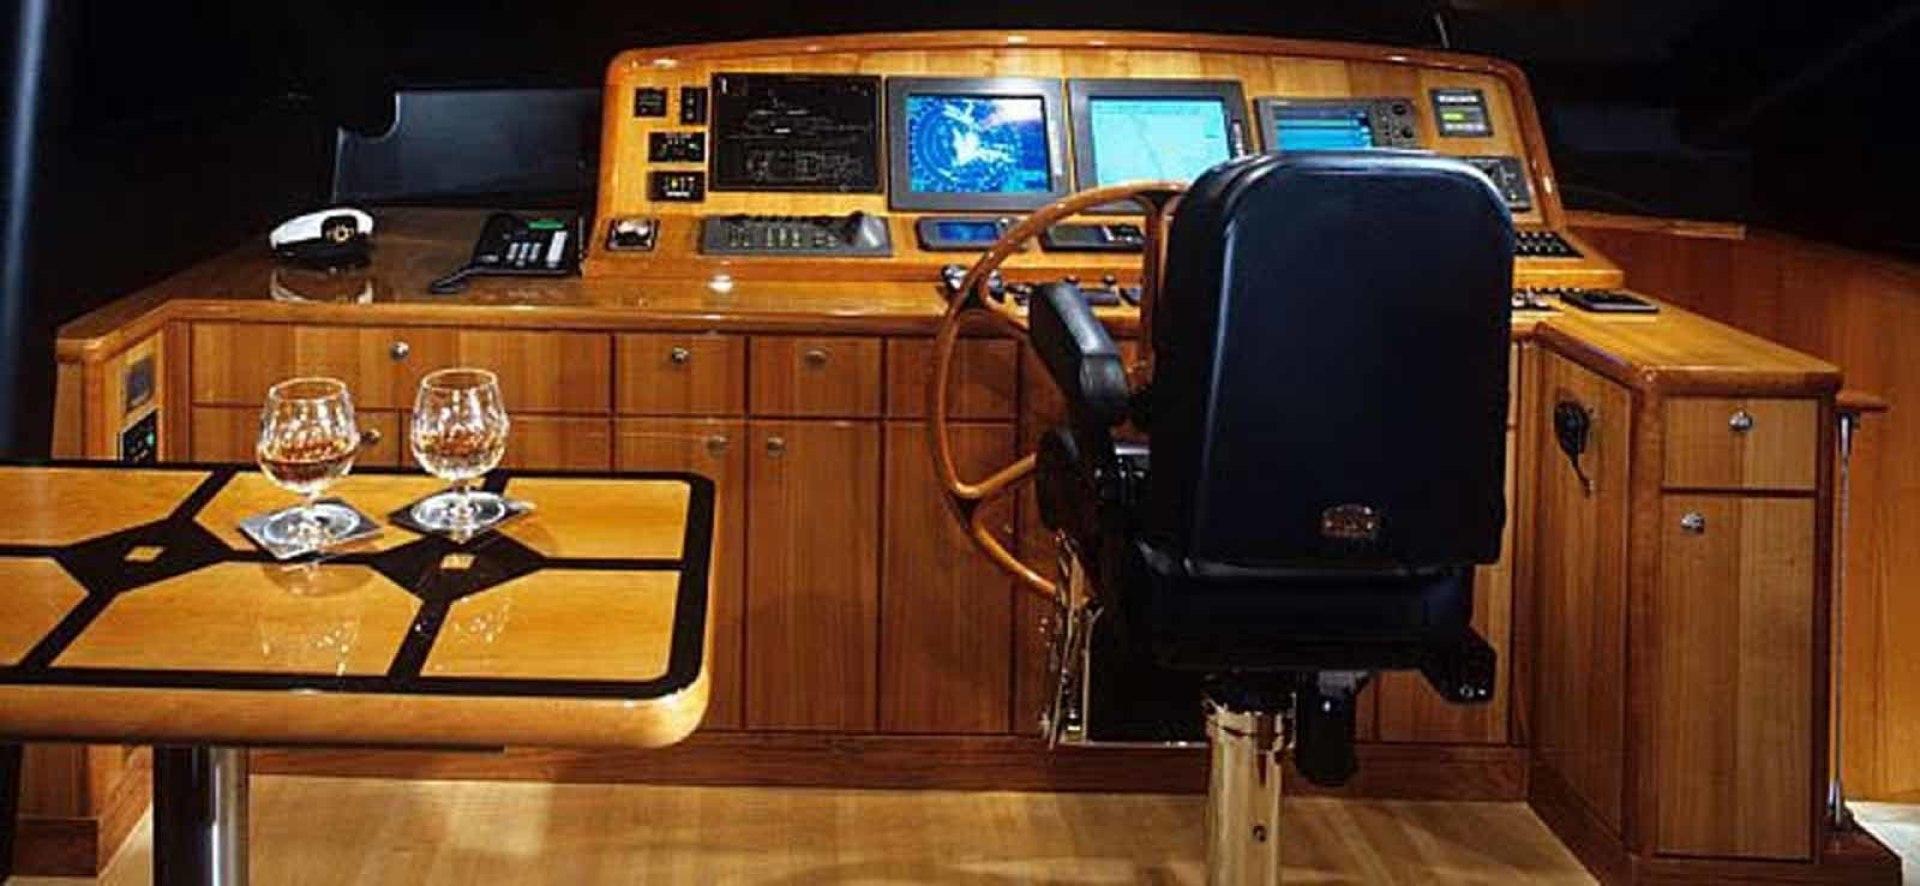 Queenship-Barretta 76 2004-SEA MYSTIC Fort Myers-Florida-United States-Helm-1588098 | Thumbnail